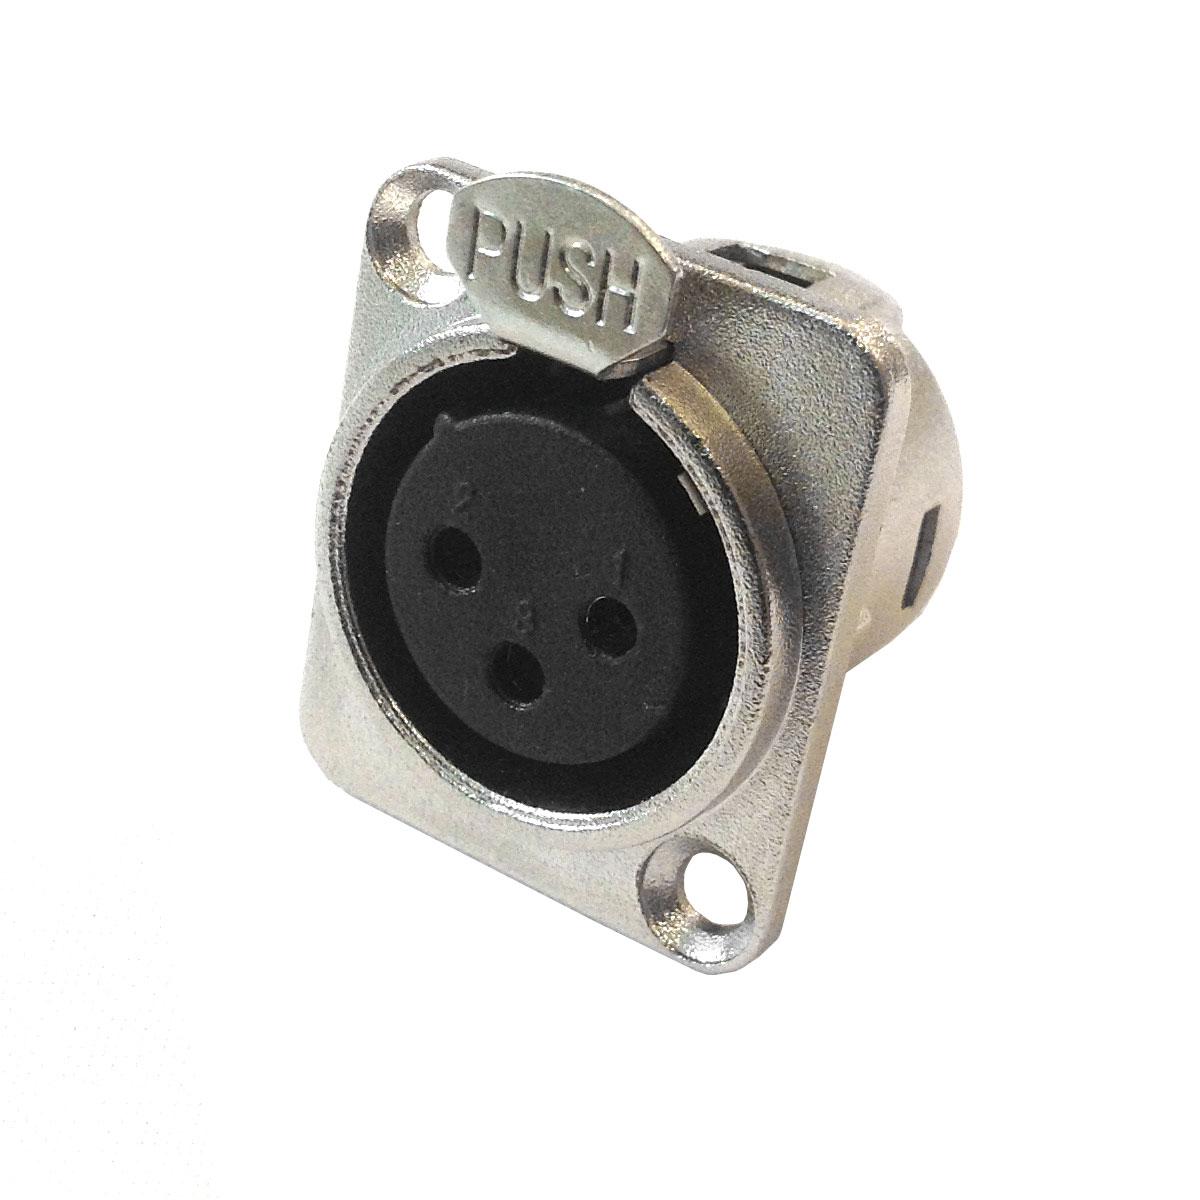 Conector Cannon XLR F�mea Painel WC 823 - Wireconex